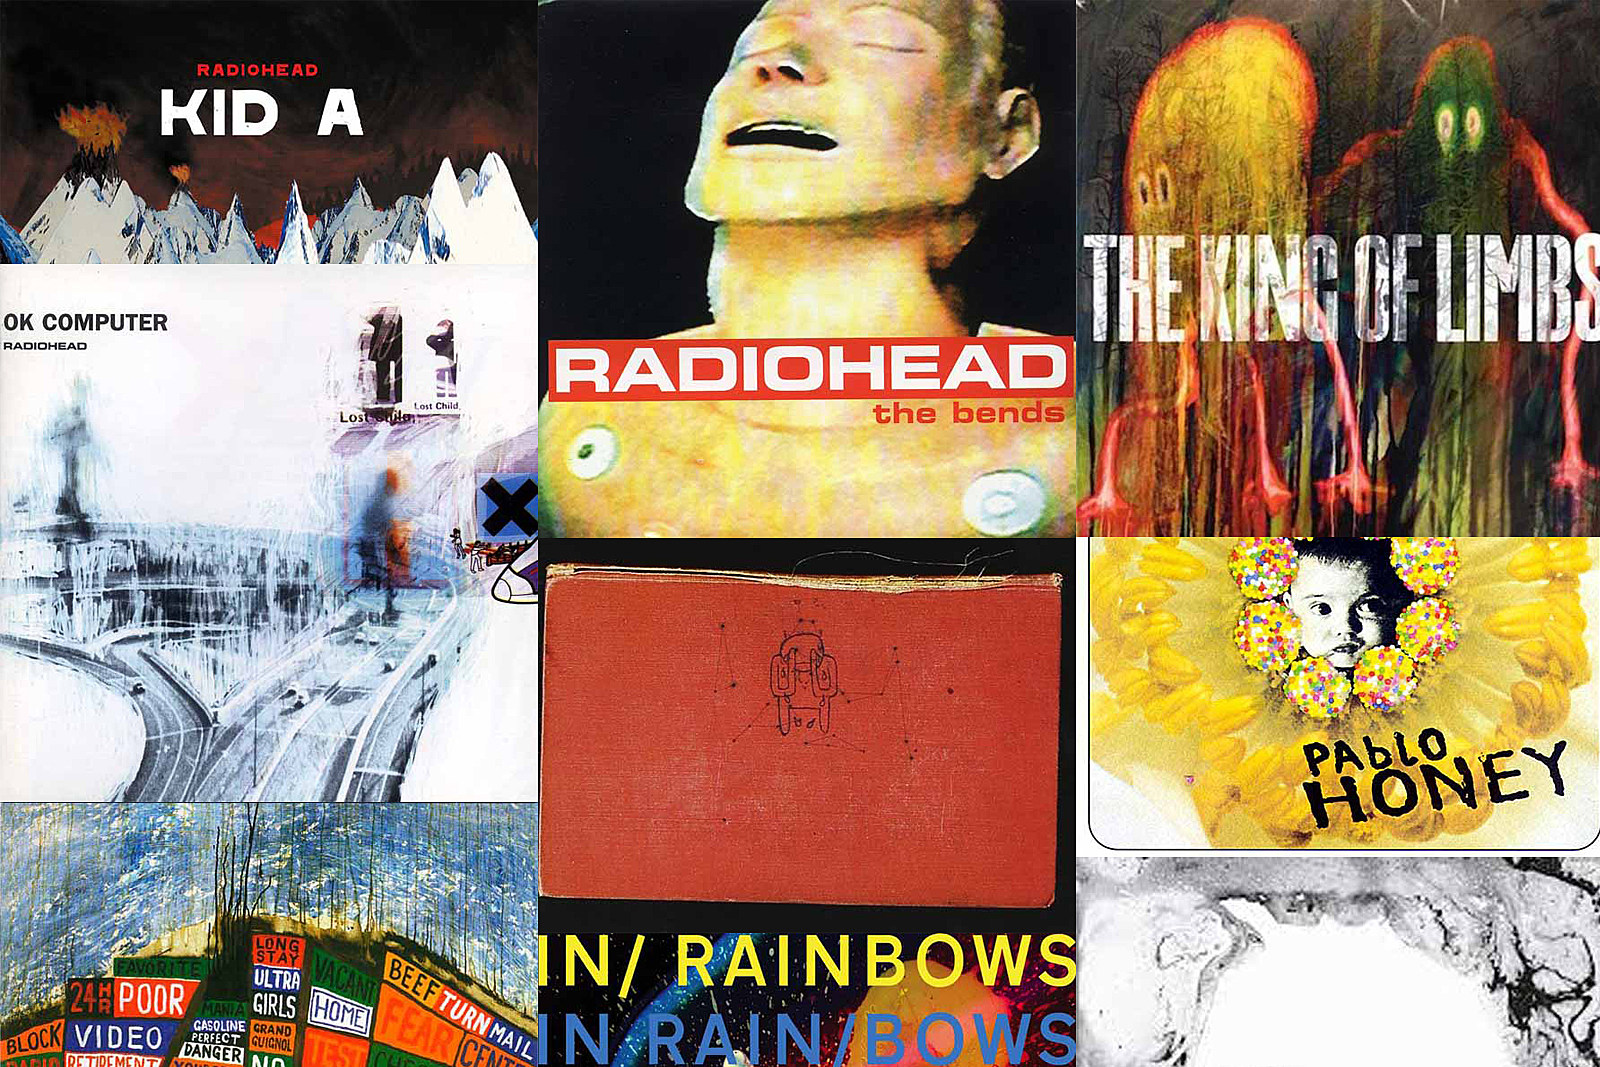 Radiohead Albums Ranked Worst to Best